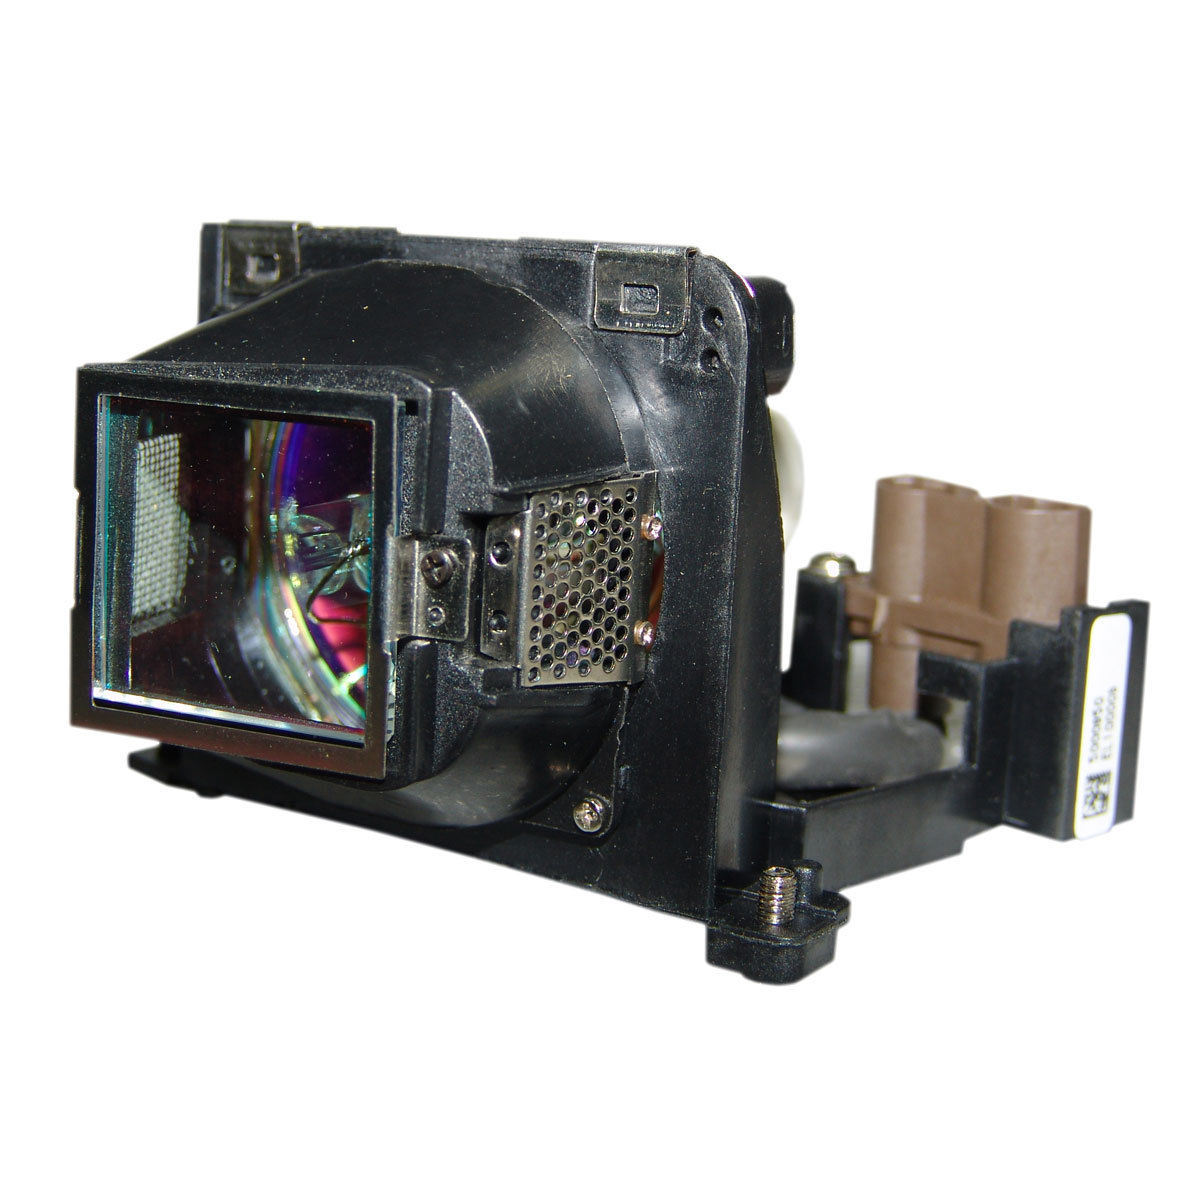 Projector Lamp Bulb VLT-XD205LP VLTXD205LP XD205LP for Mitsubishi SD205 SD205R SD205U XD205 XD205U XD205R XD205U-G with housing free shipping high quality projector bulb only vlt xd205lp for mitsubishi md 330s md 330x xd205 projectors 150 day warranty